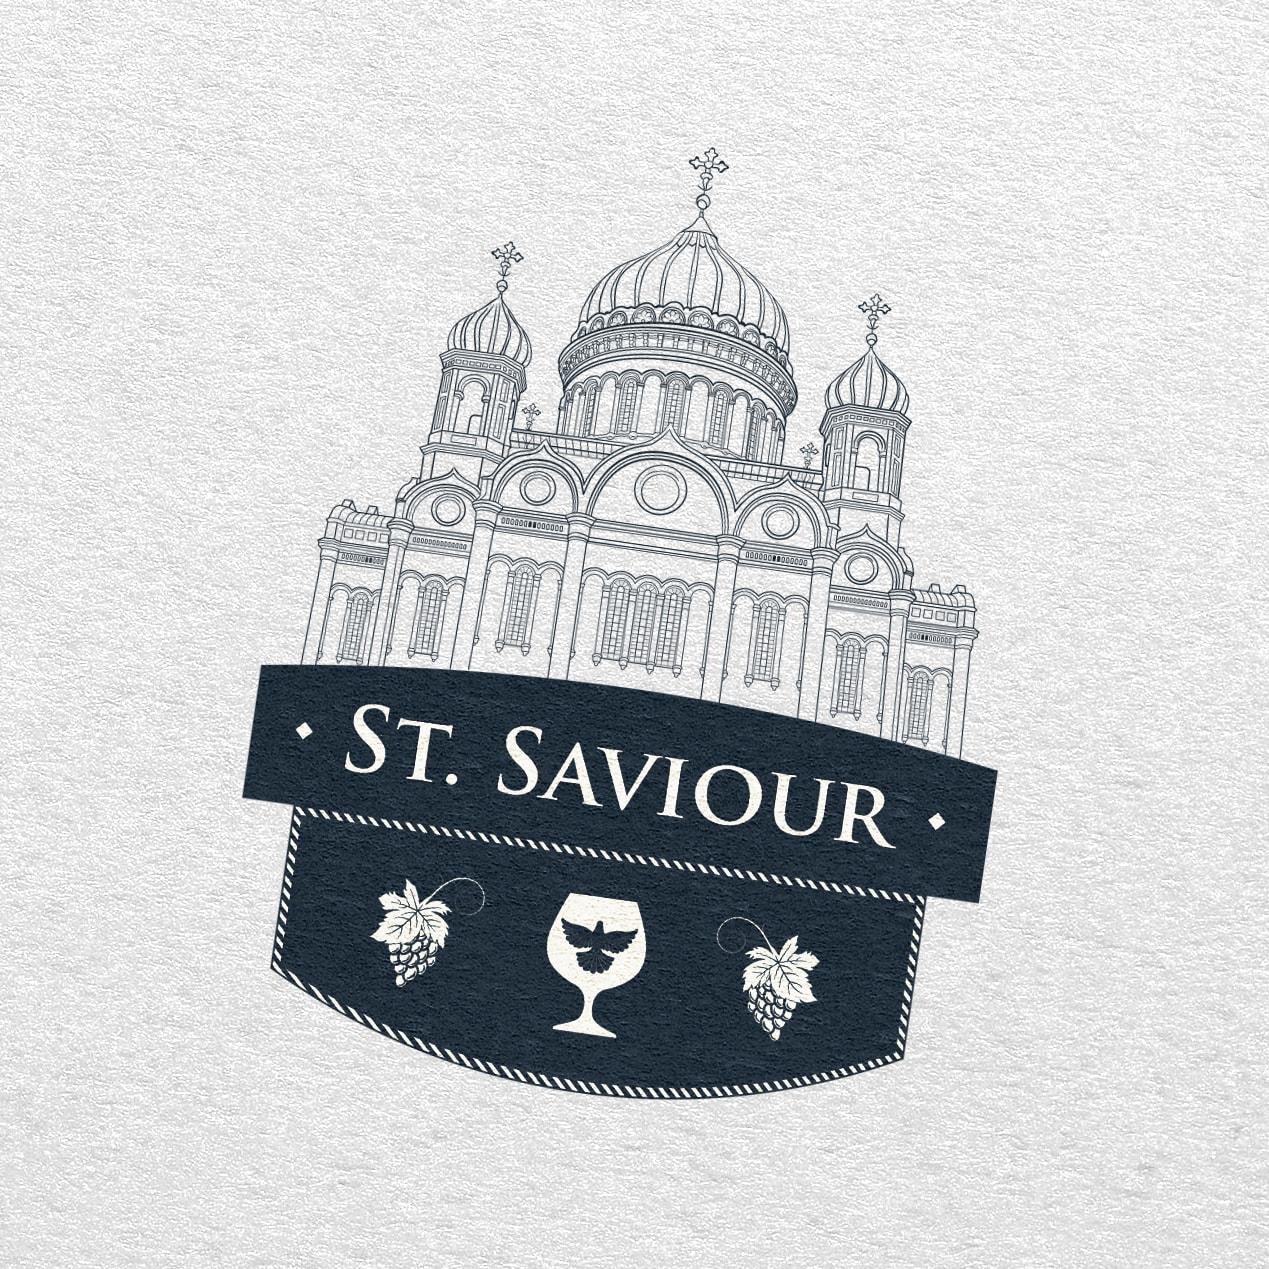 st_saviour_7